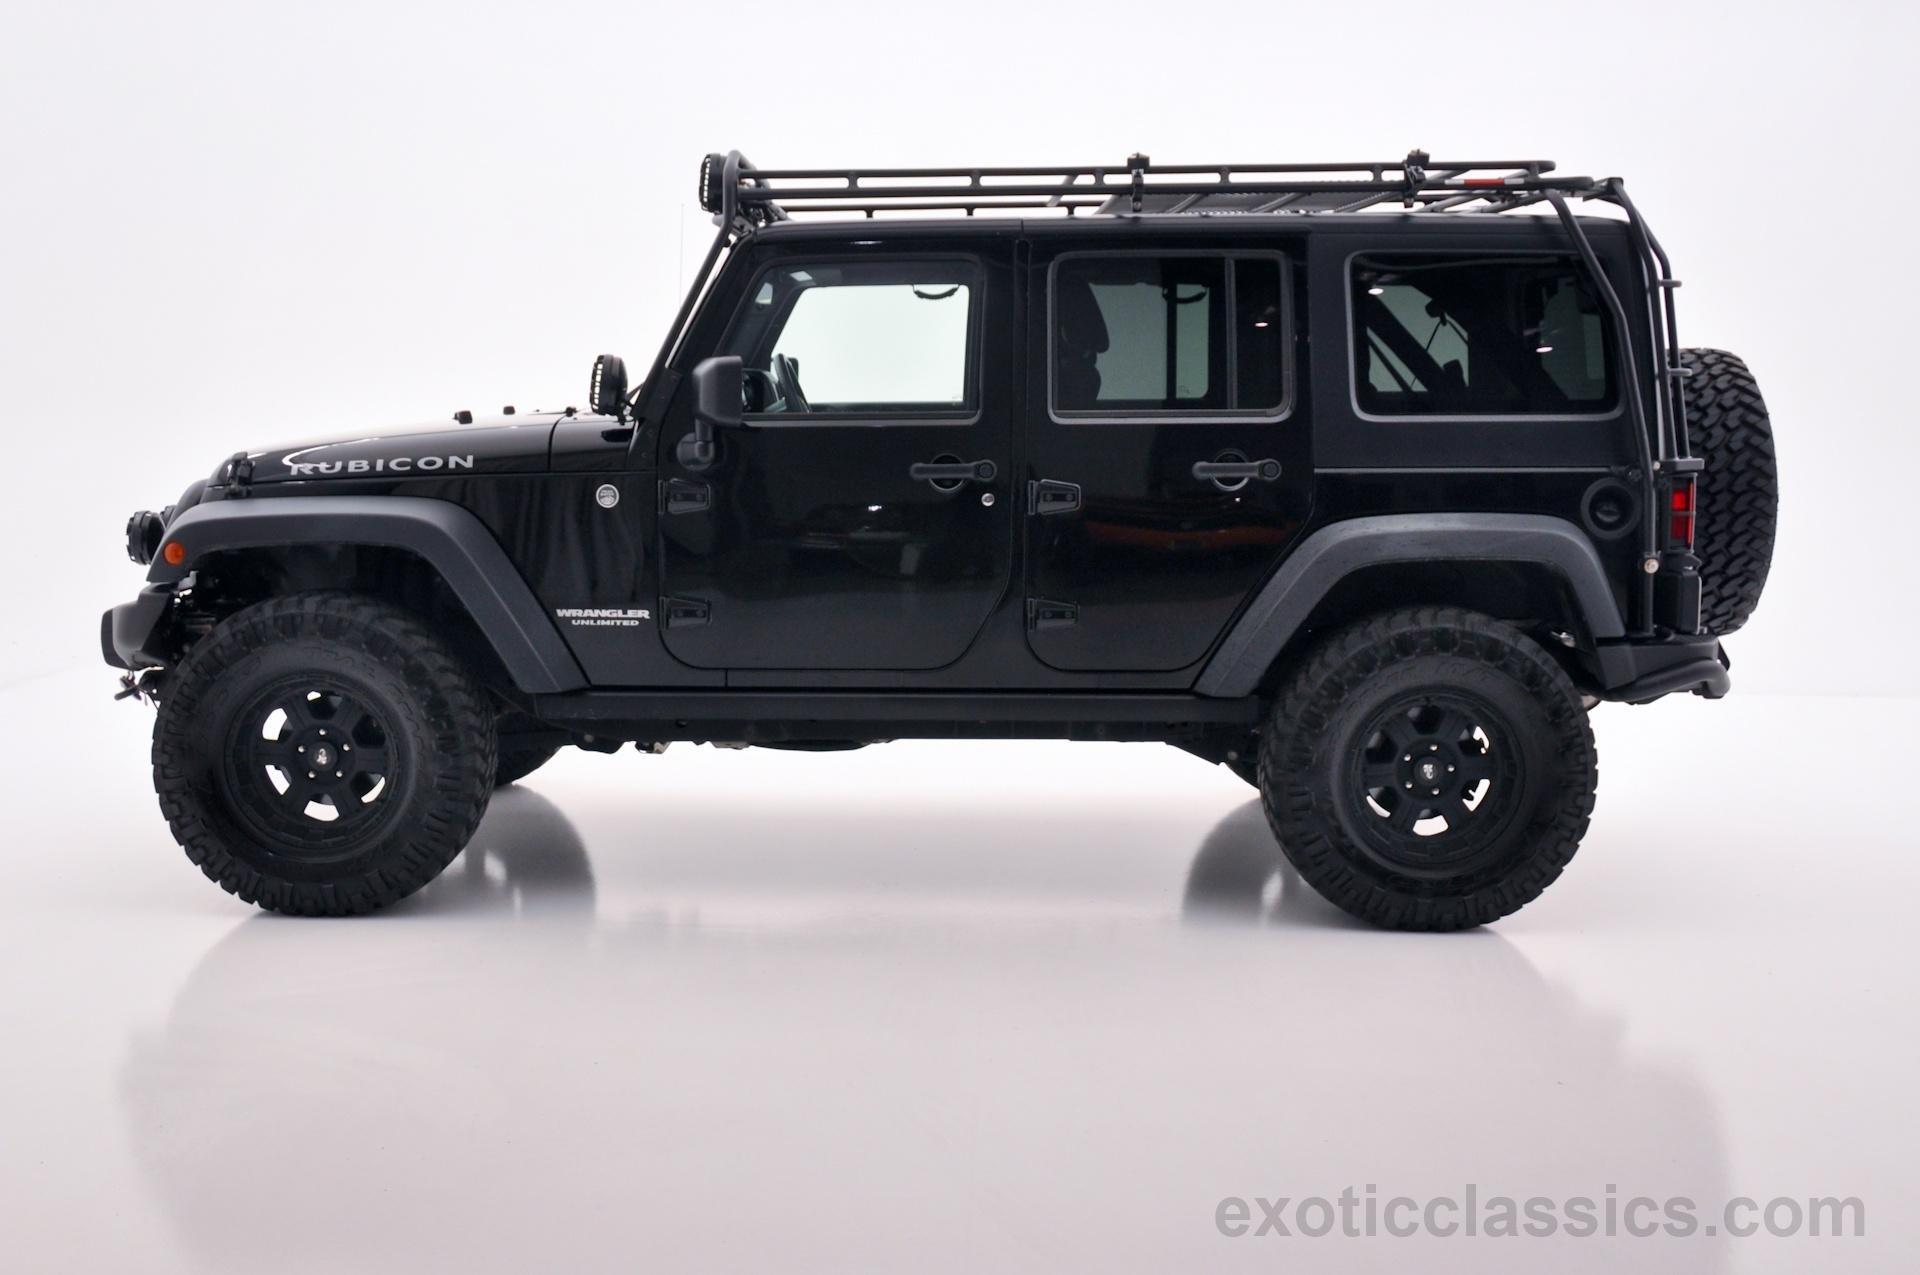 2011 jeep wrangler unlimited rubicon black 4wd all road 4x4 cars wallpaper 1920x1275 711425. Black Bedroom Furniture Sets. Home Design Ideas